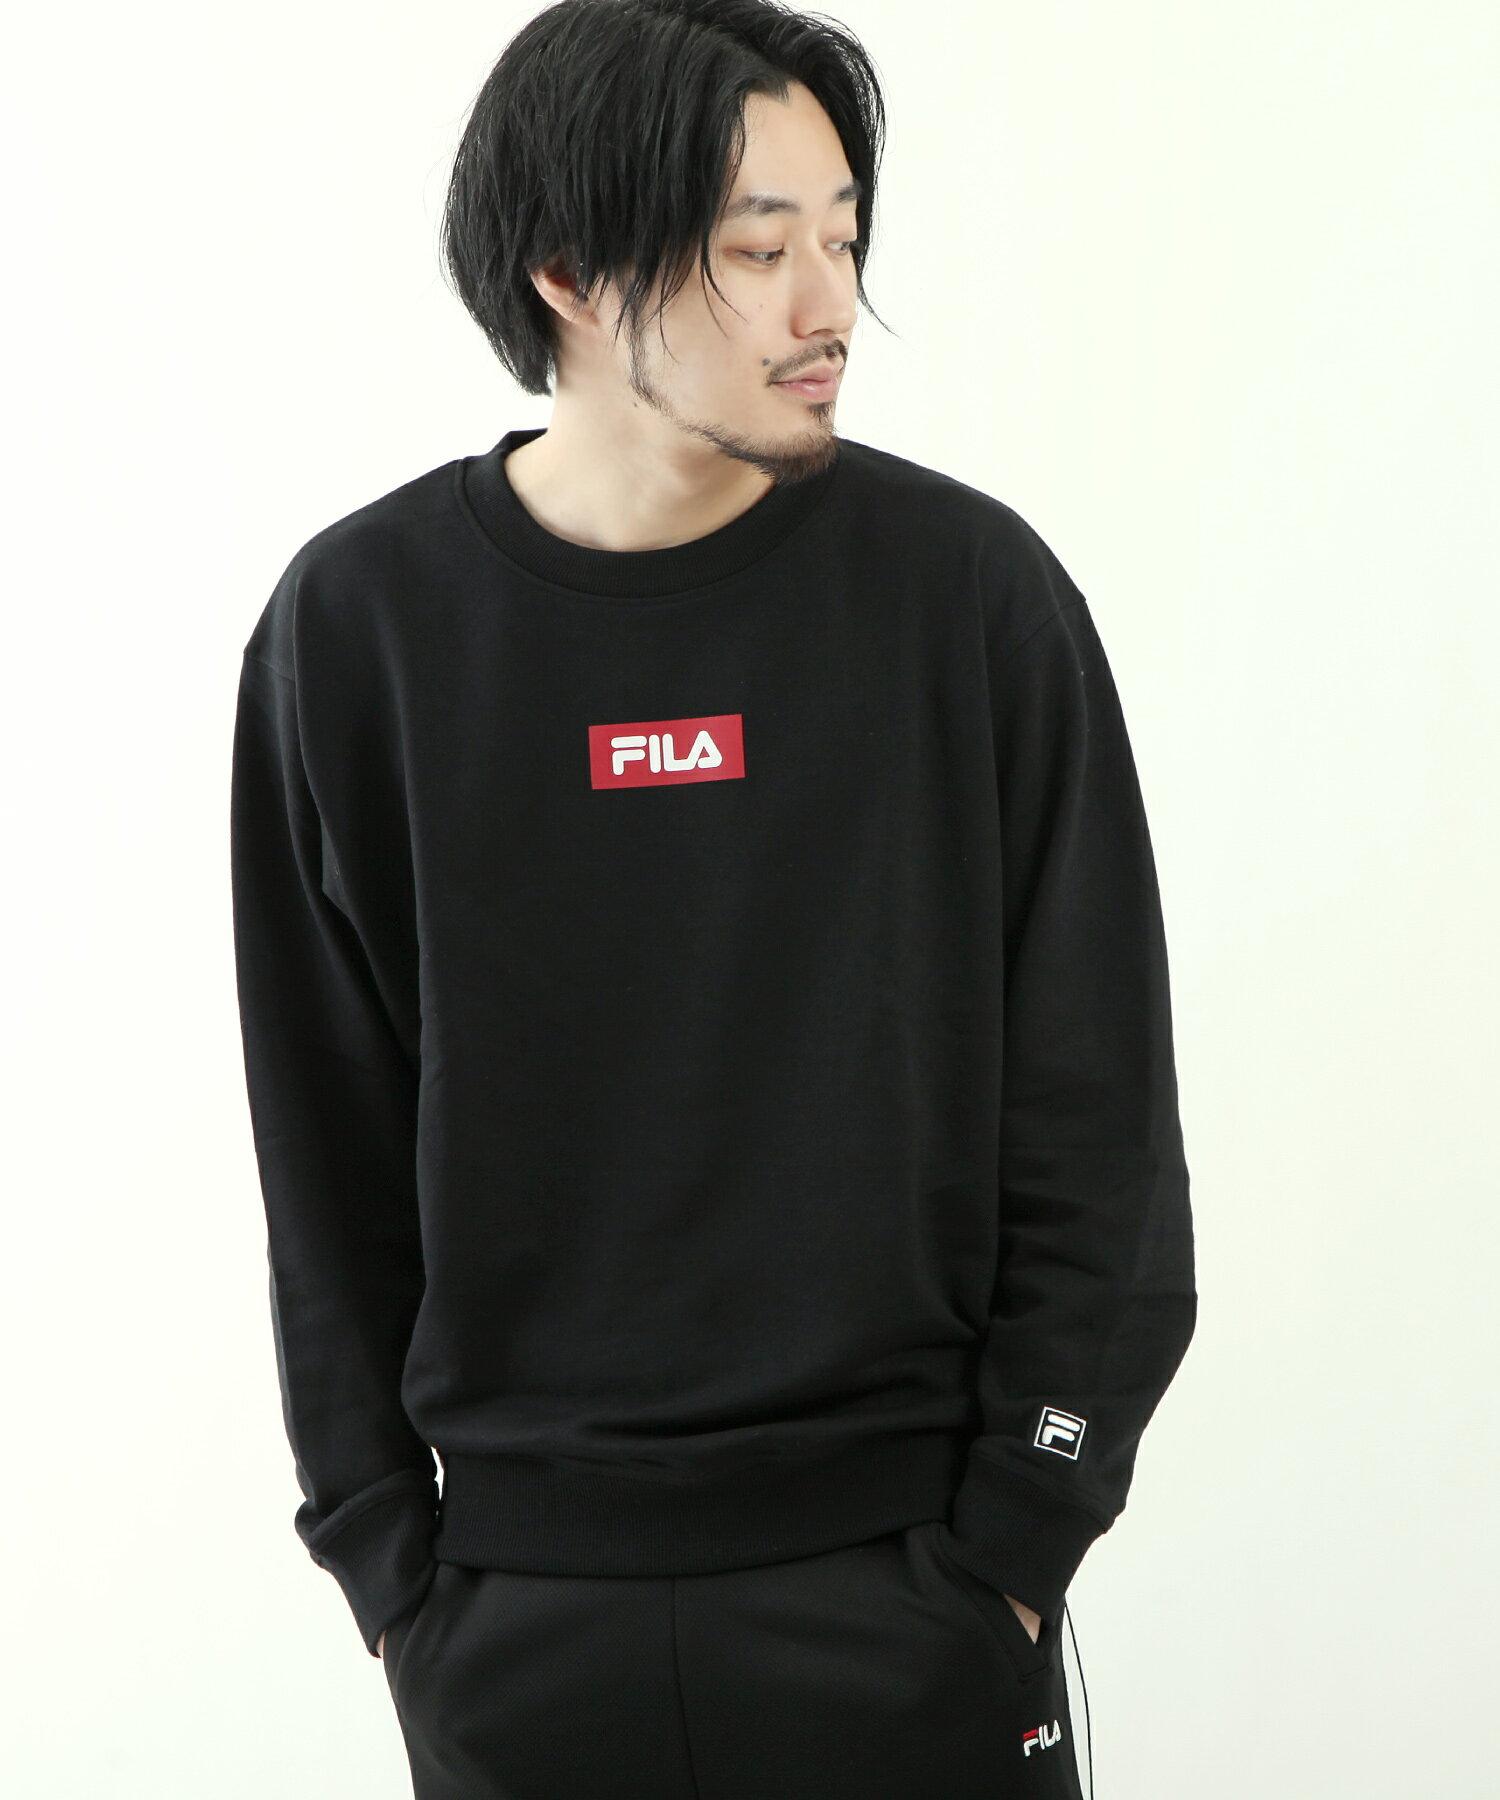 【FILA】方格LOGO運動衫 2